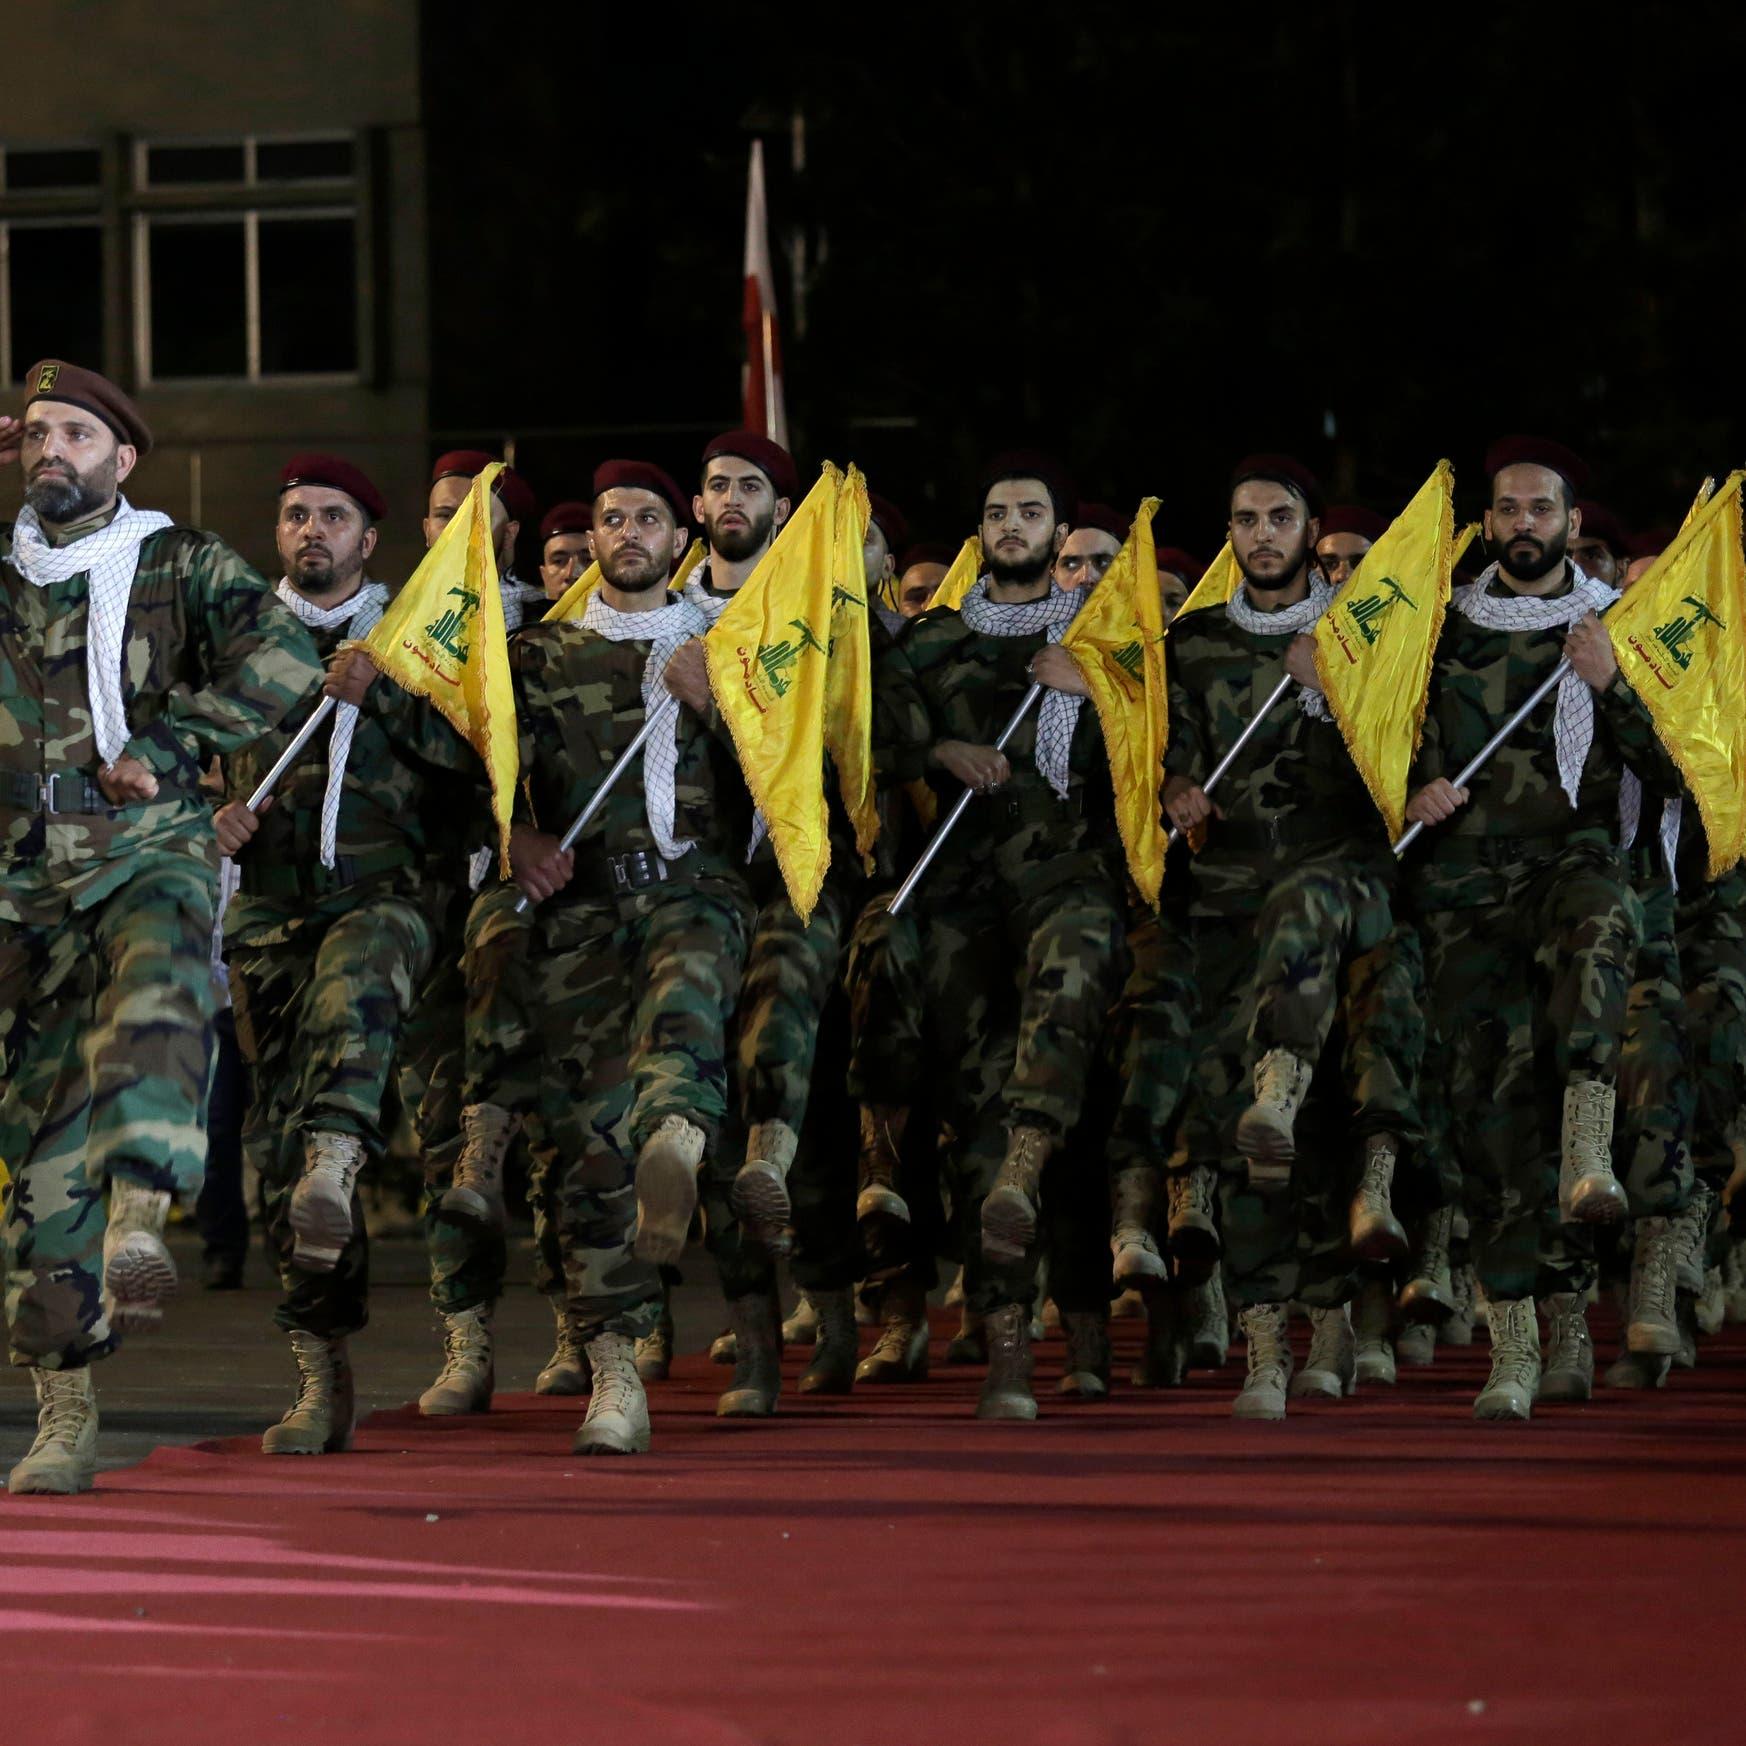 إيران تمسك عنق لبنان.. والحكومة